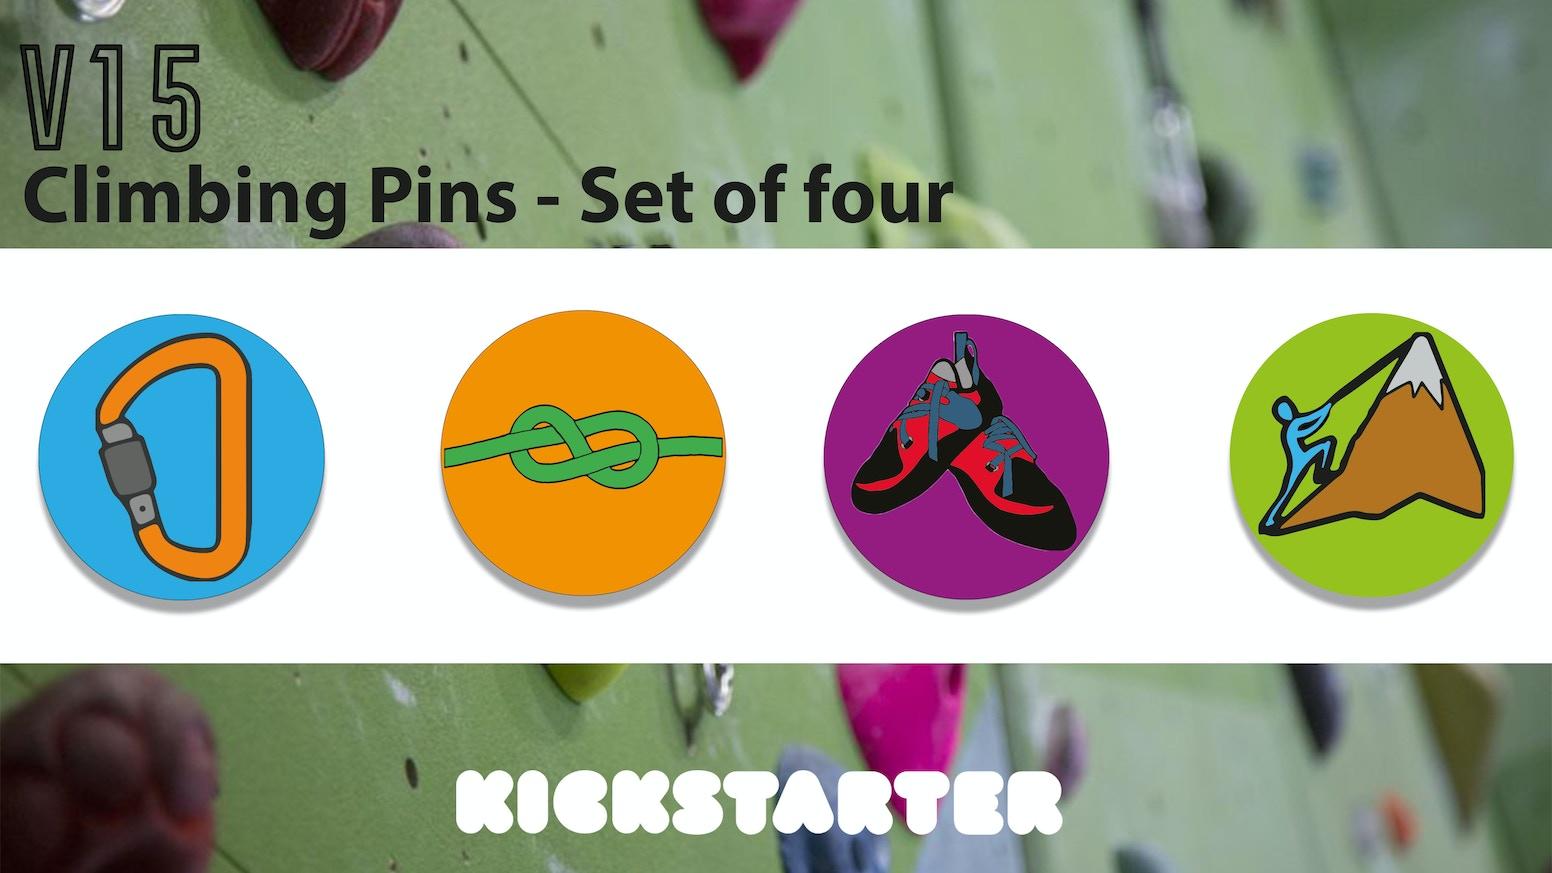 Climbing themed pins!